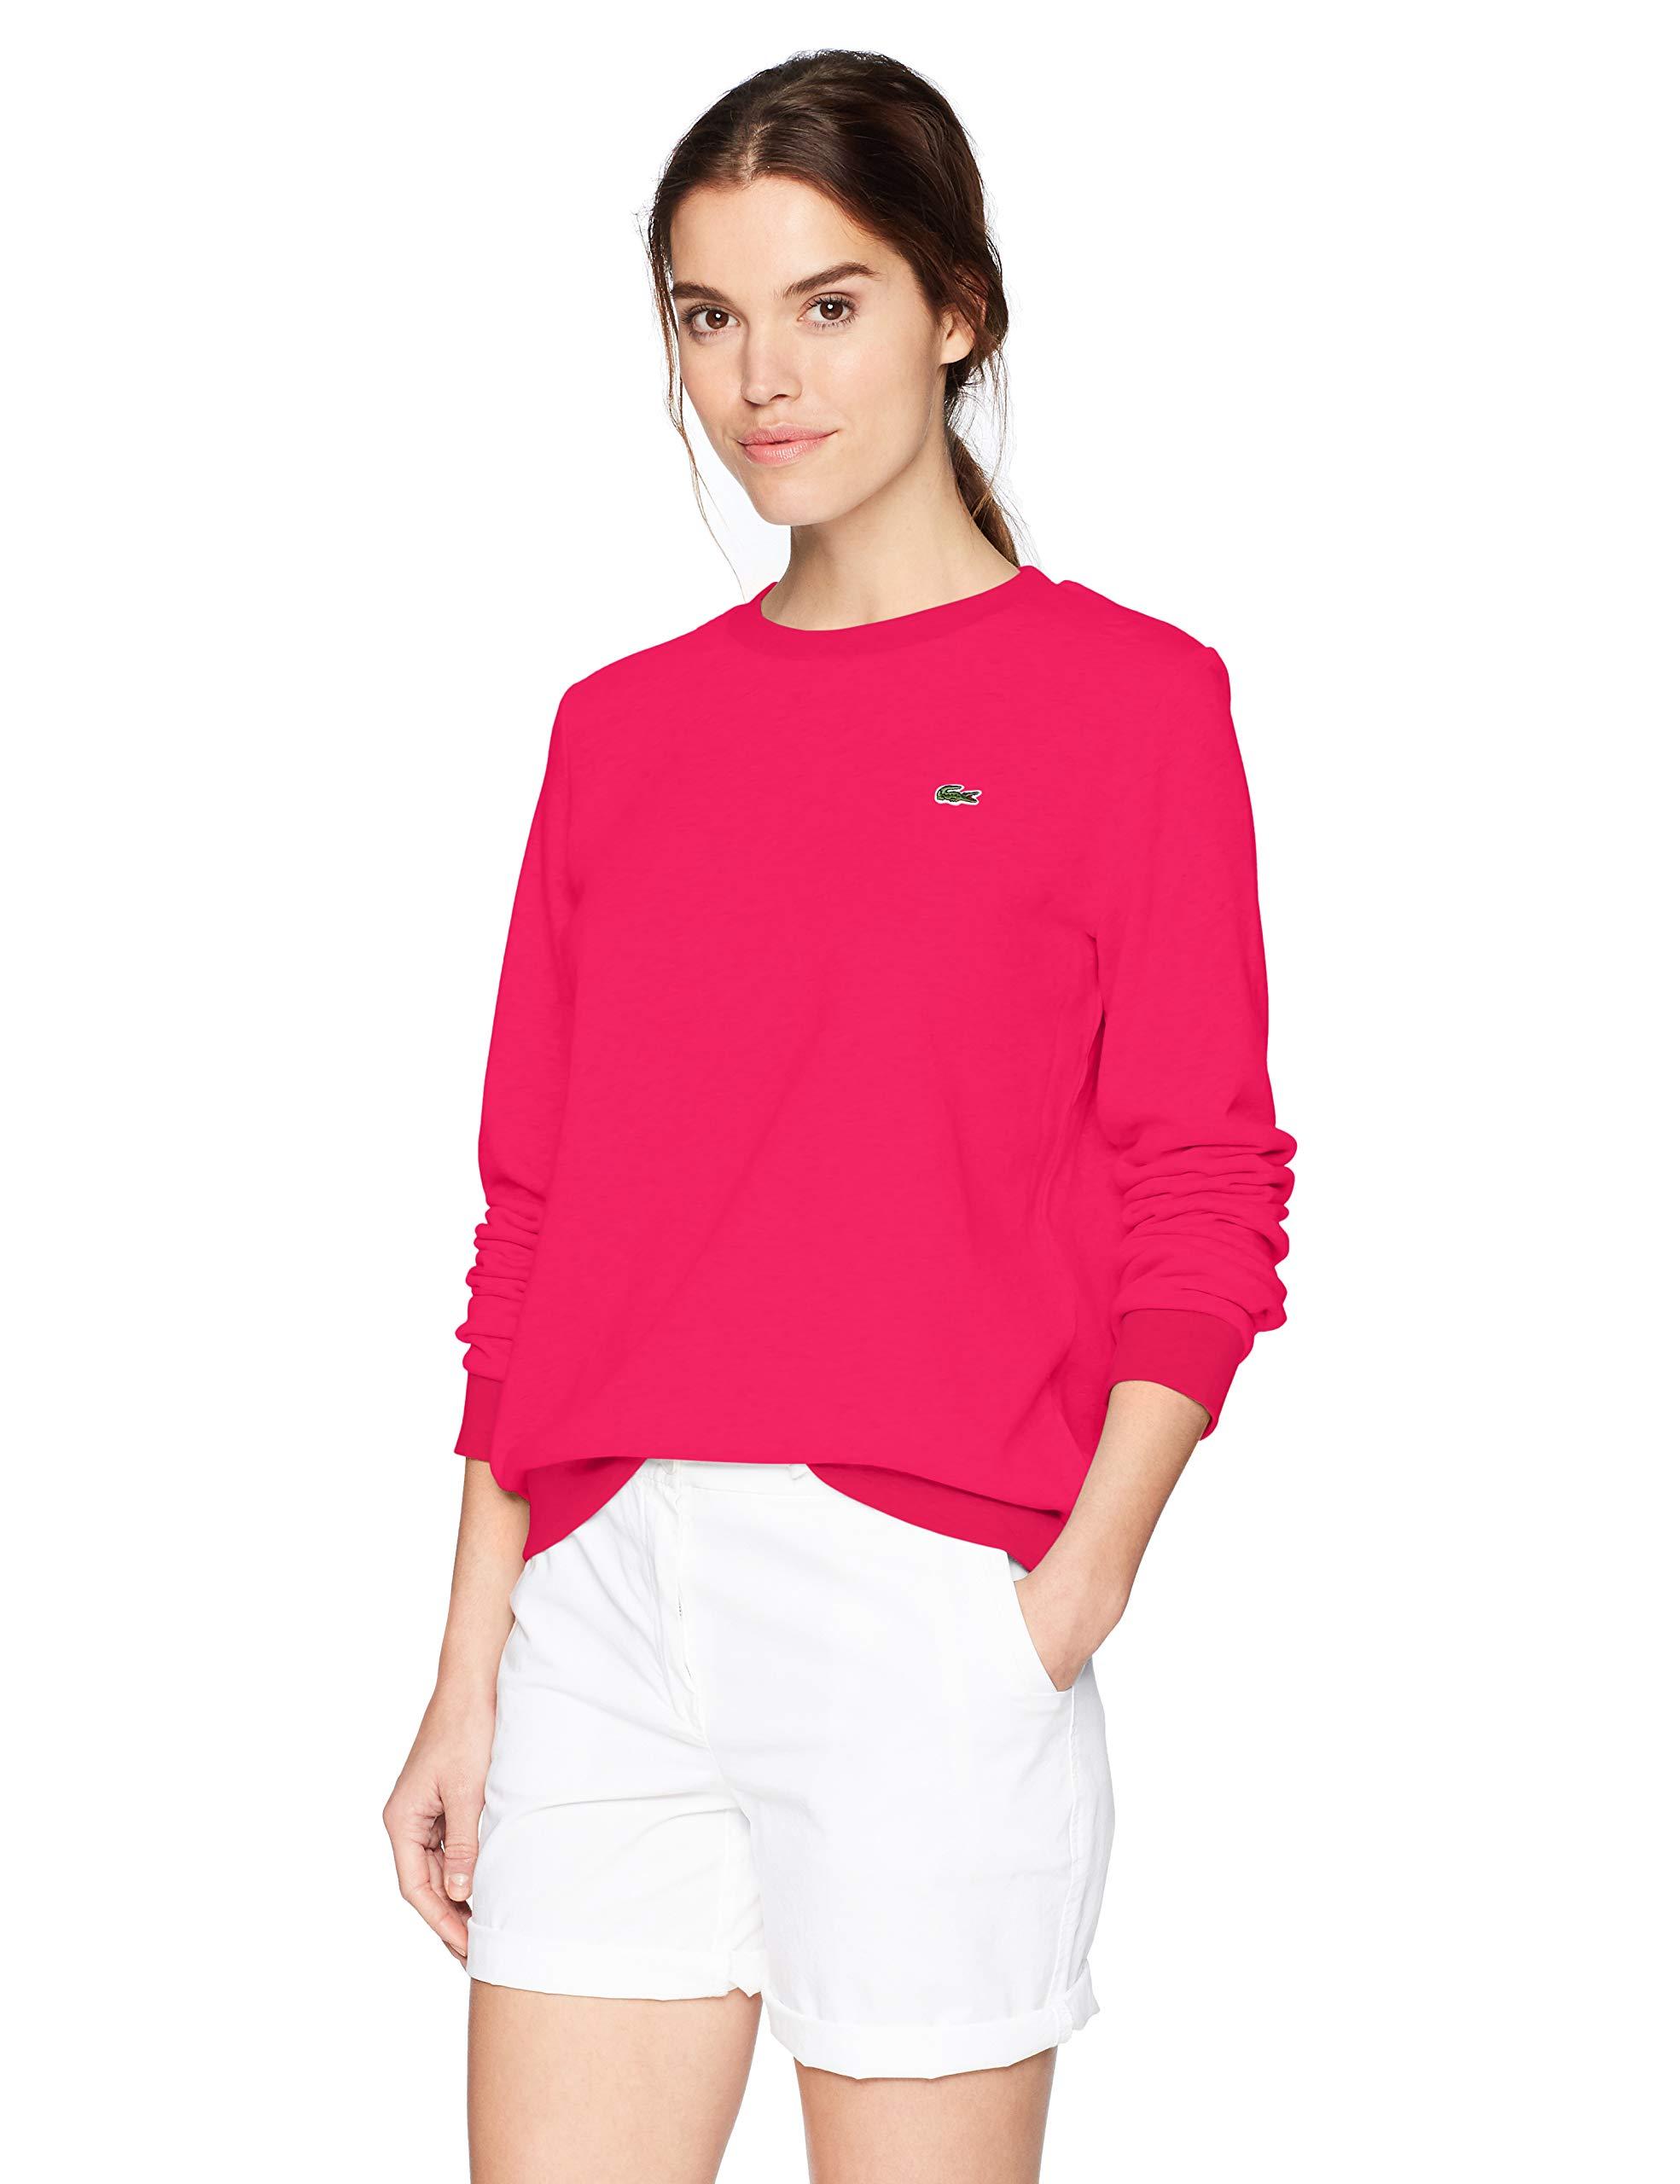 Lacoste Womens Sport Long Sleeve Fleece Crewneck Sweatshirt